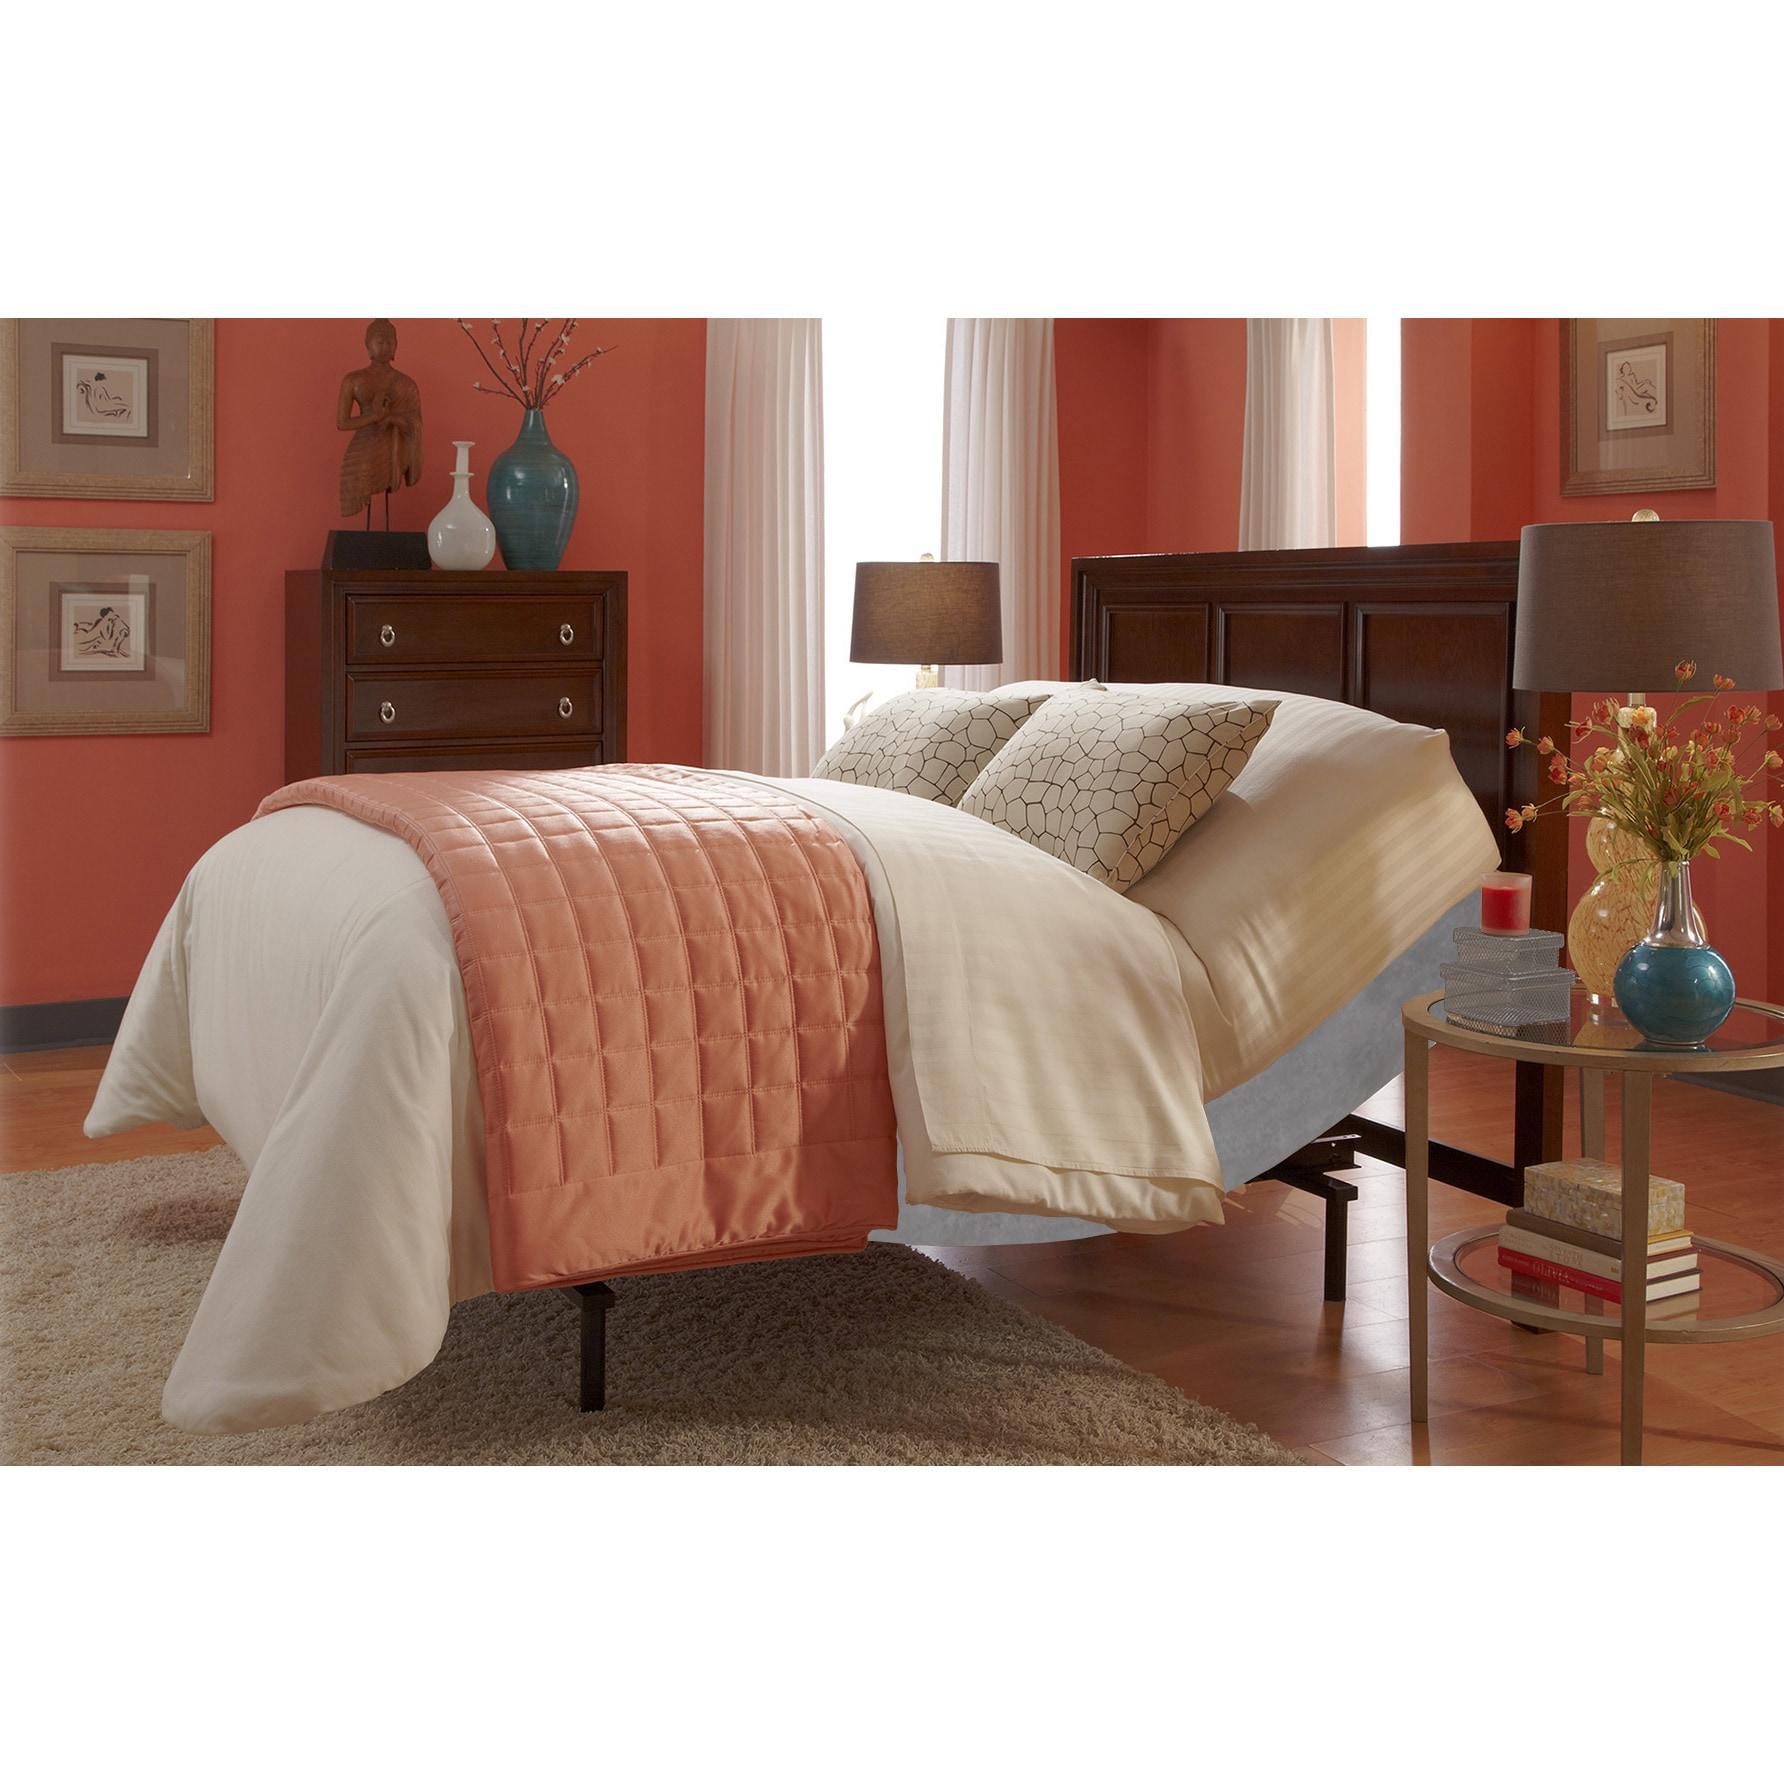 Fashion Bed Group Simplicity 2.0 Grey Finish Adjustable B...